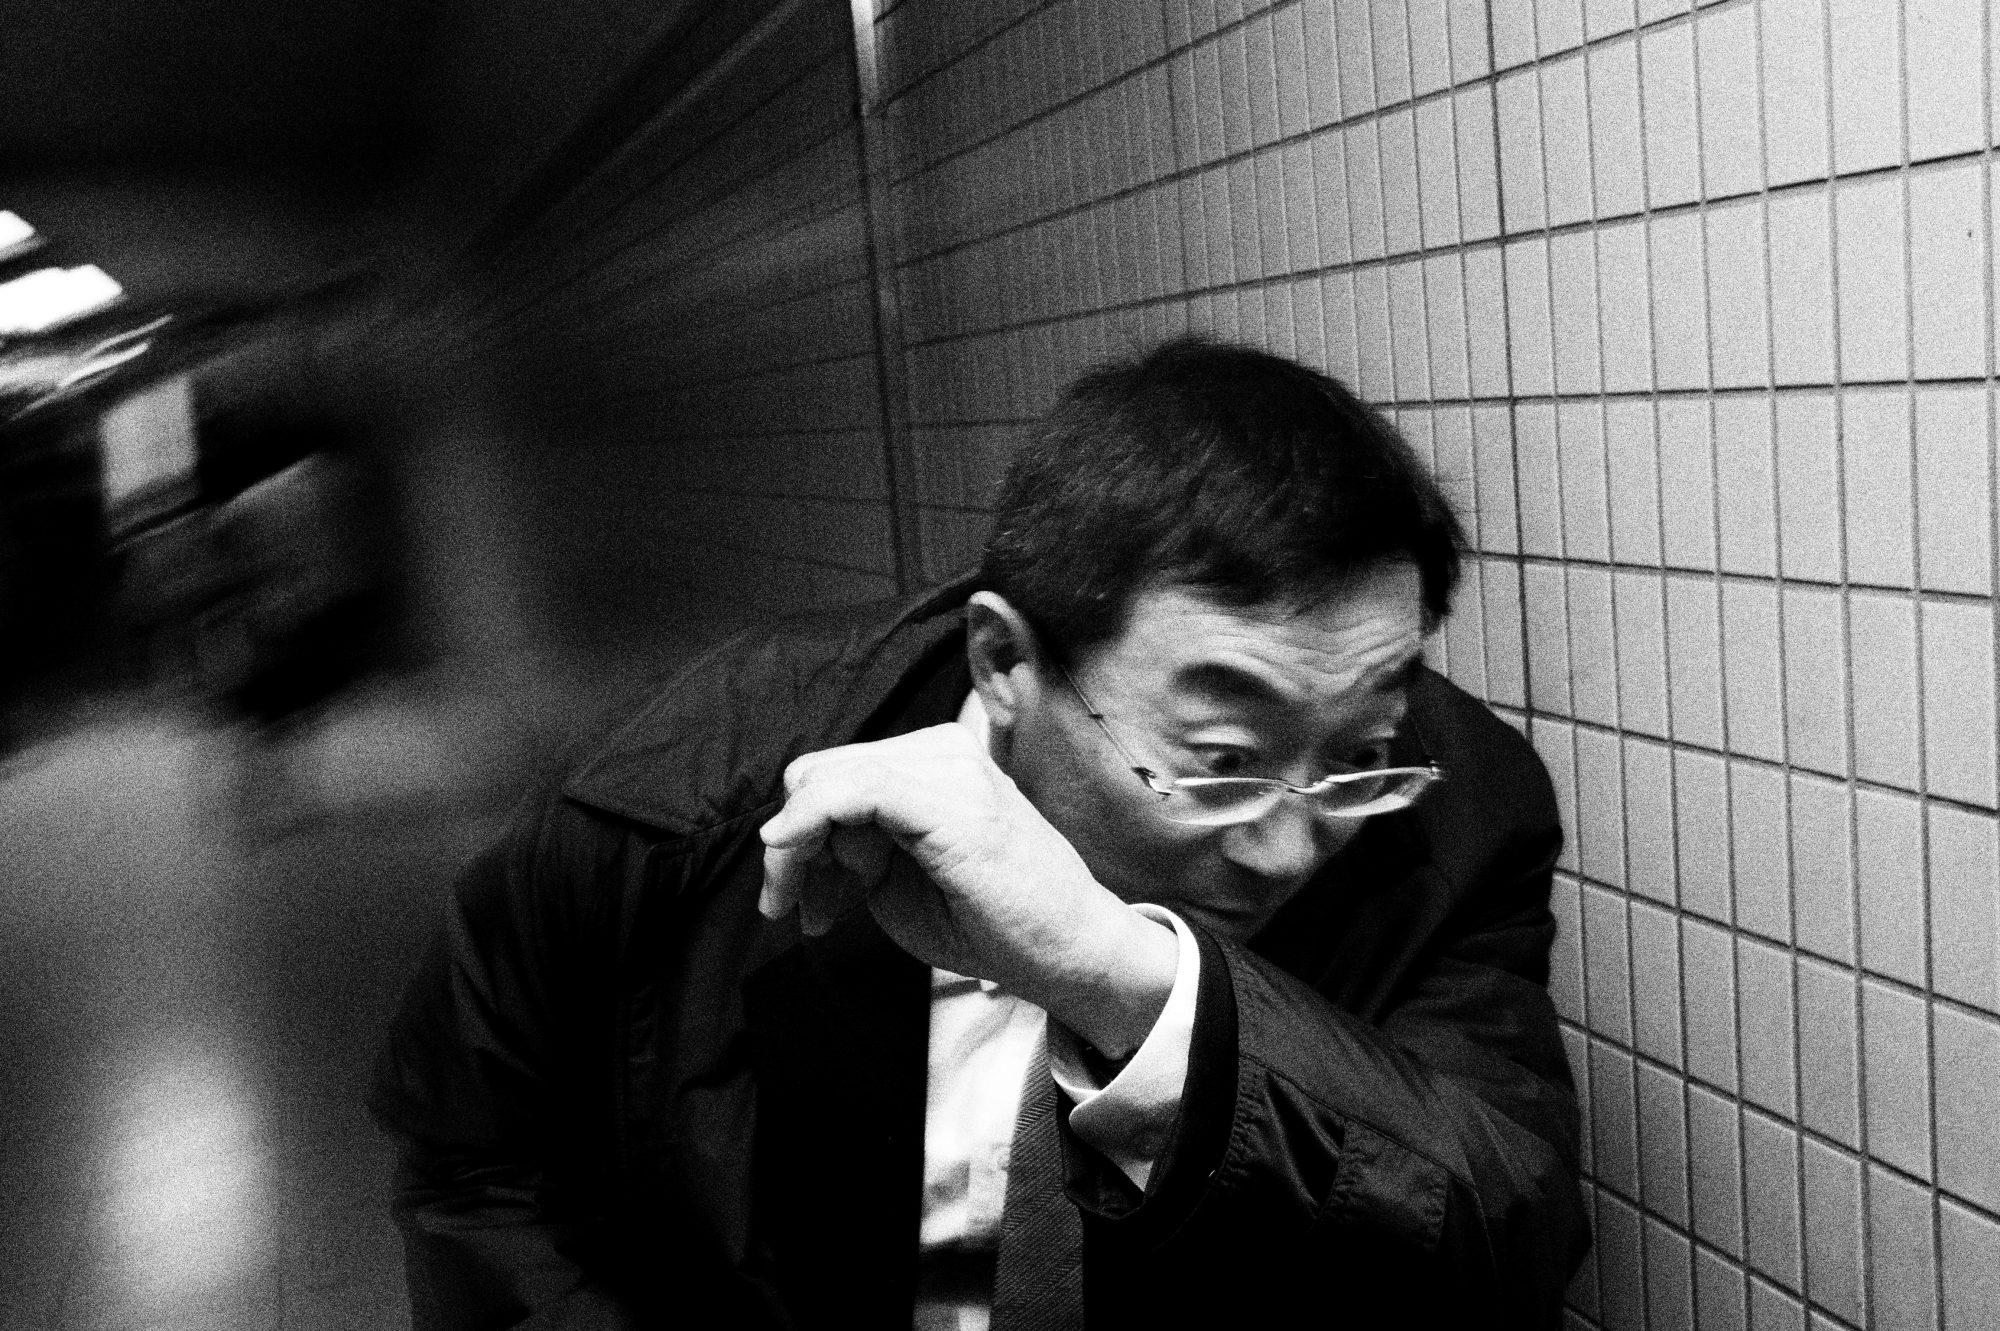 dark-skies-over-tokyo-dodge-leica-m9-2012eric-kim-street-photograpy-black-and-white-monochrome-5